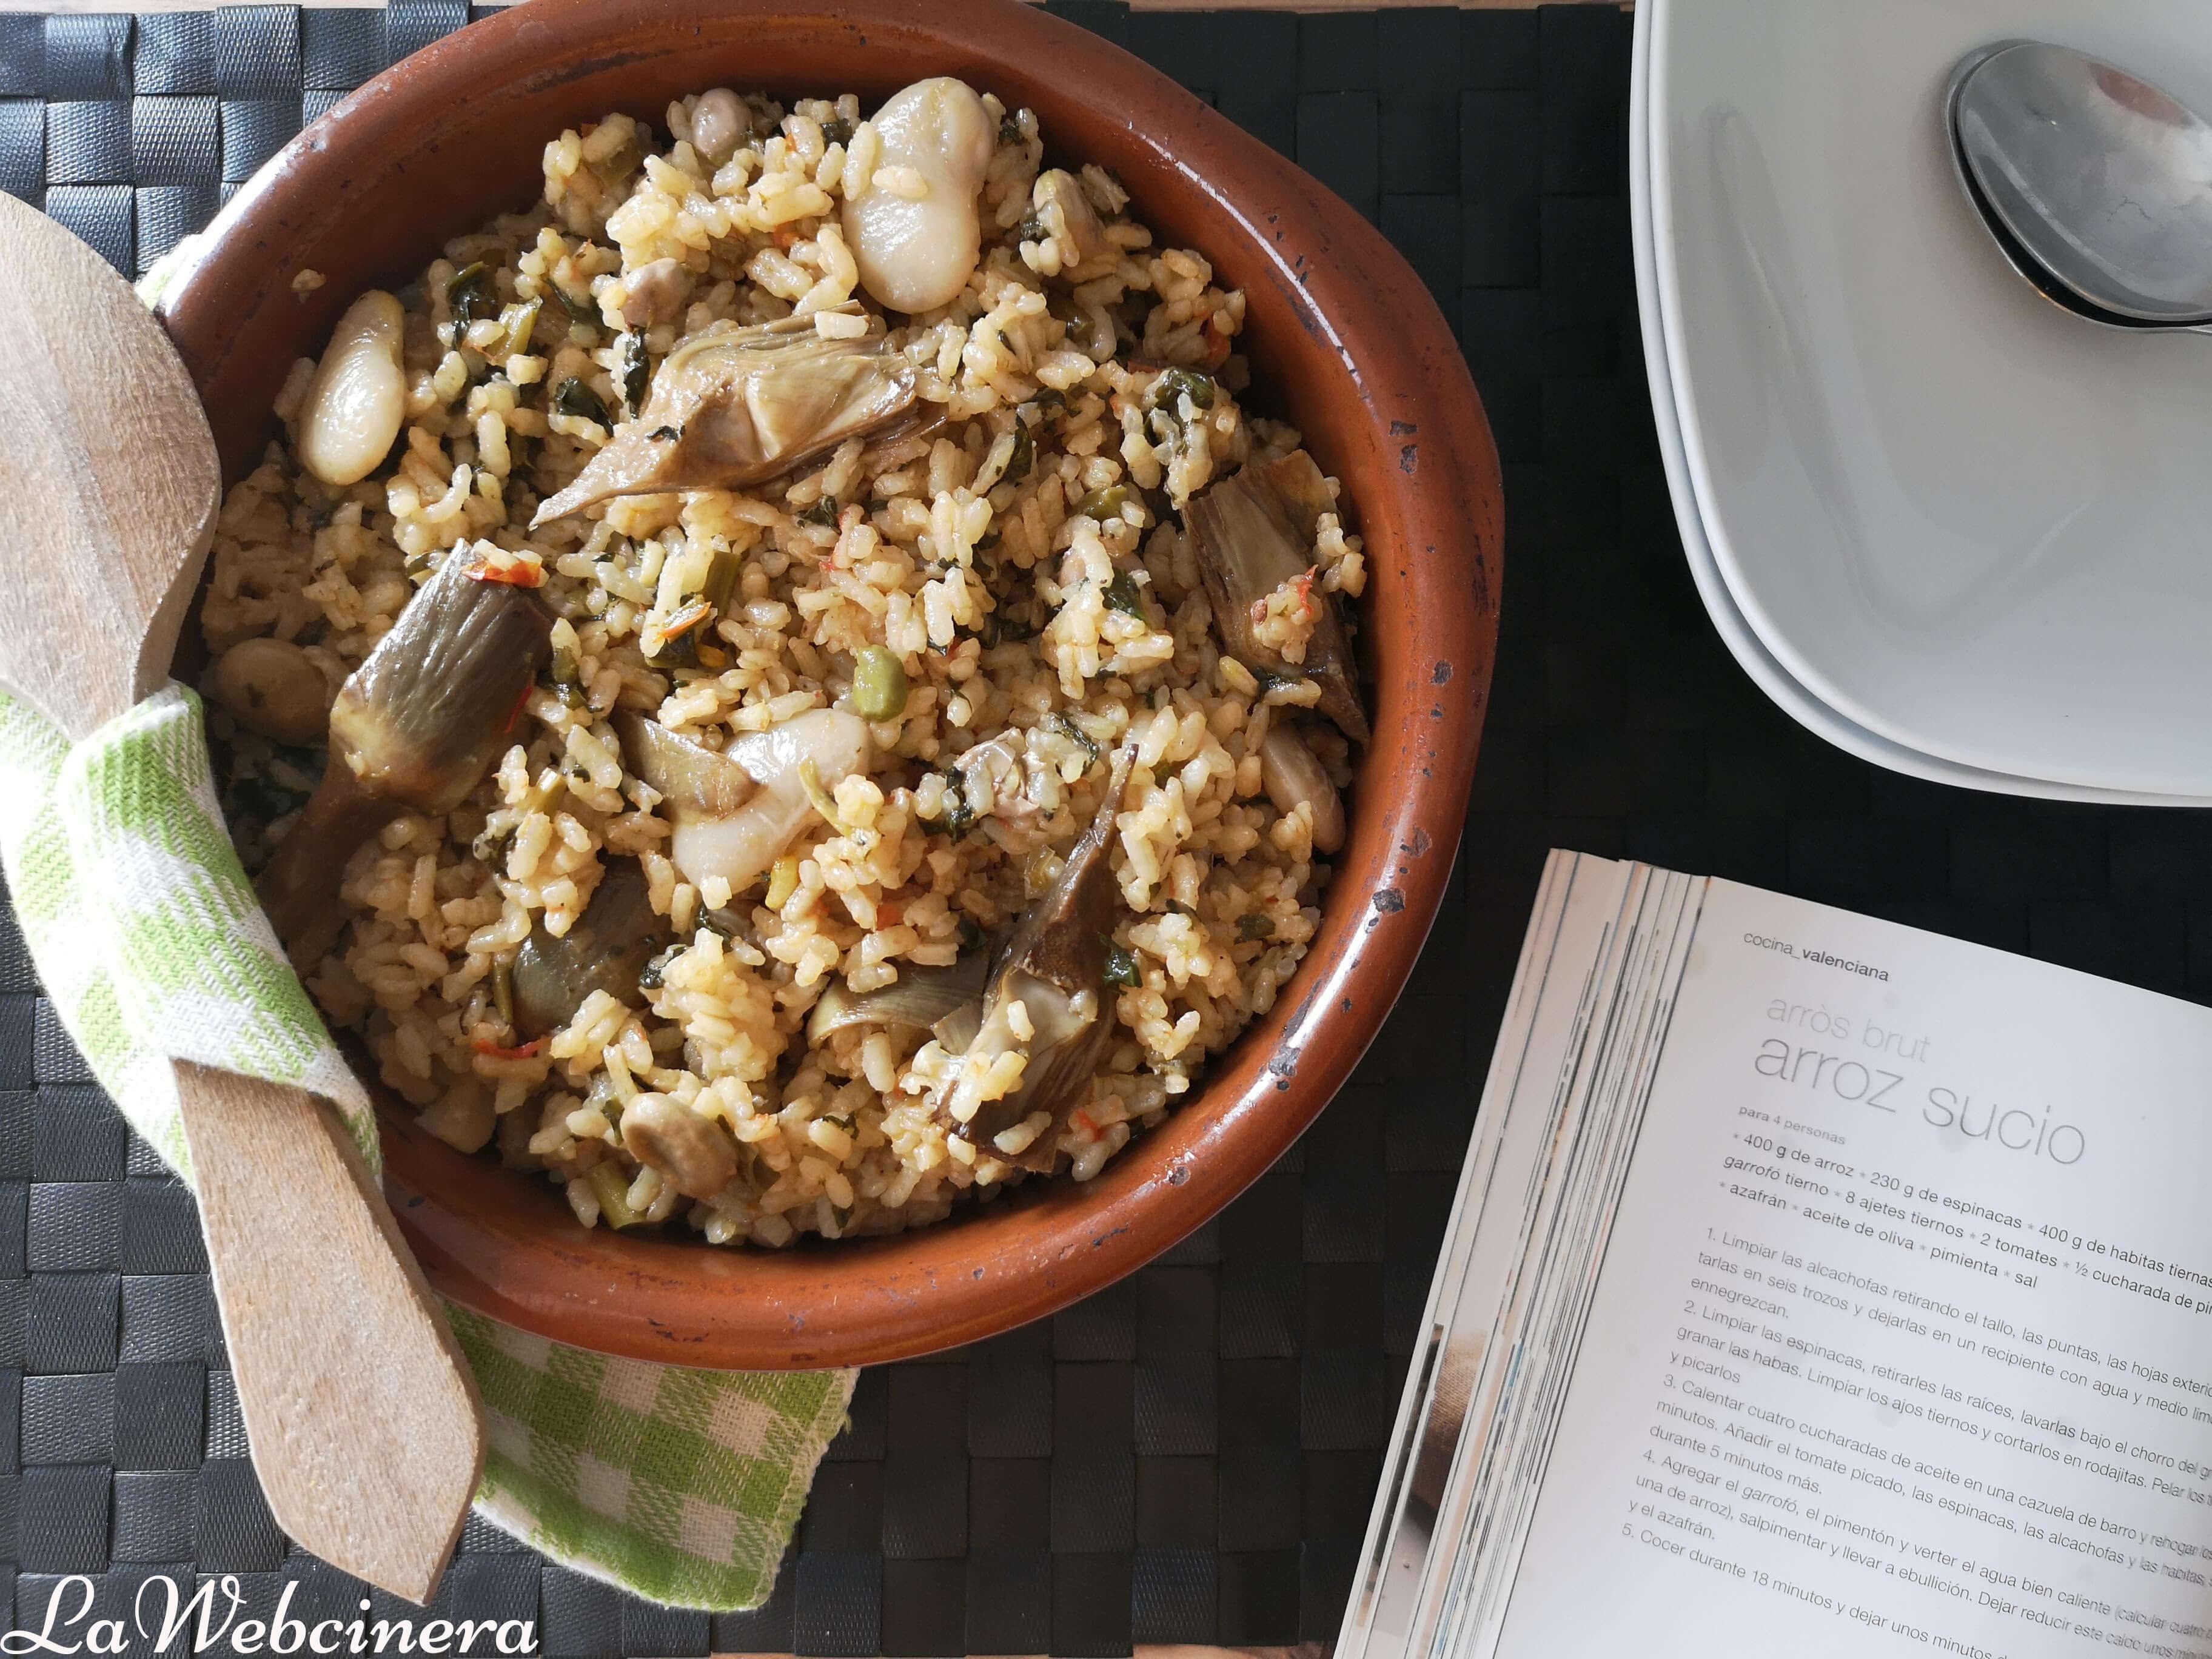 Cómo hacer arròs brut, receta típica de la Comunitat Valenciana